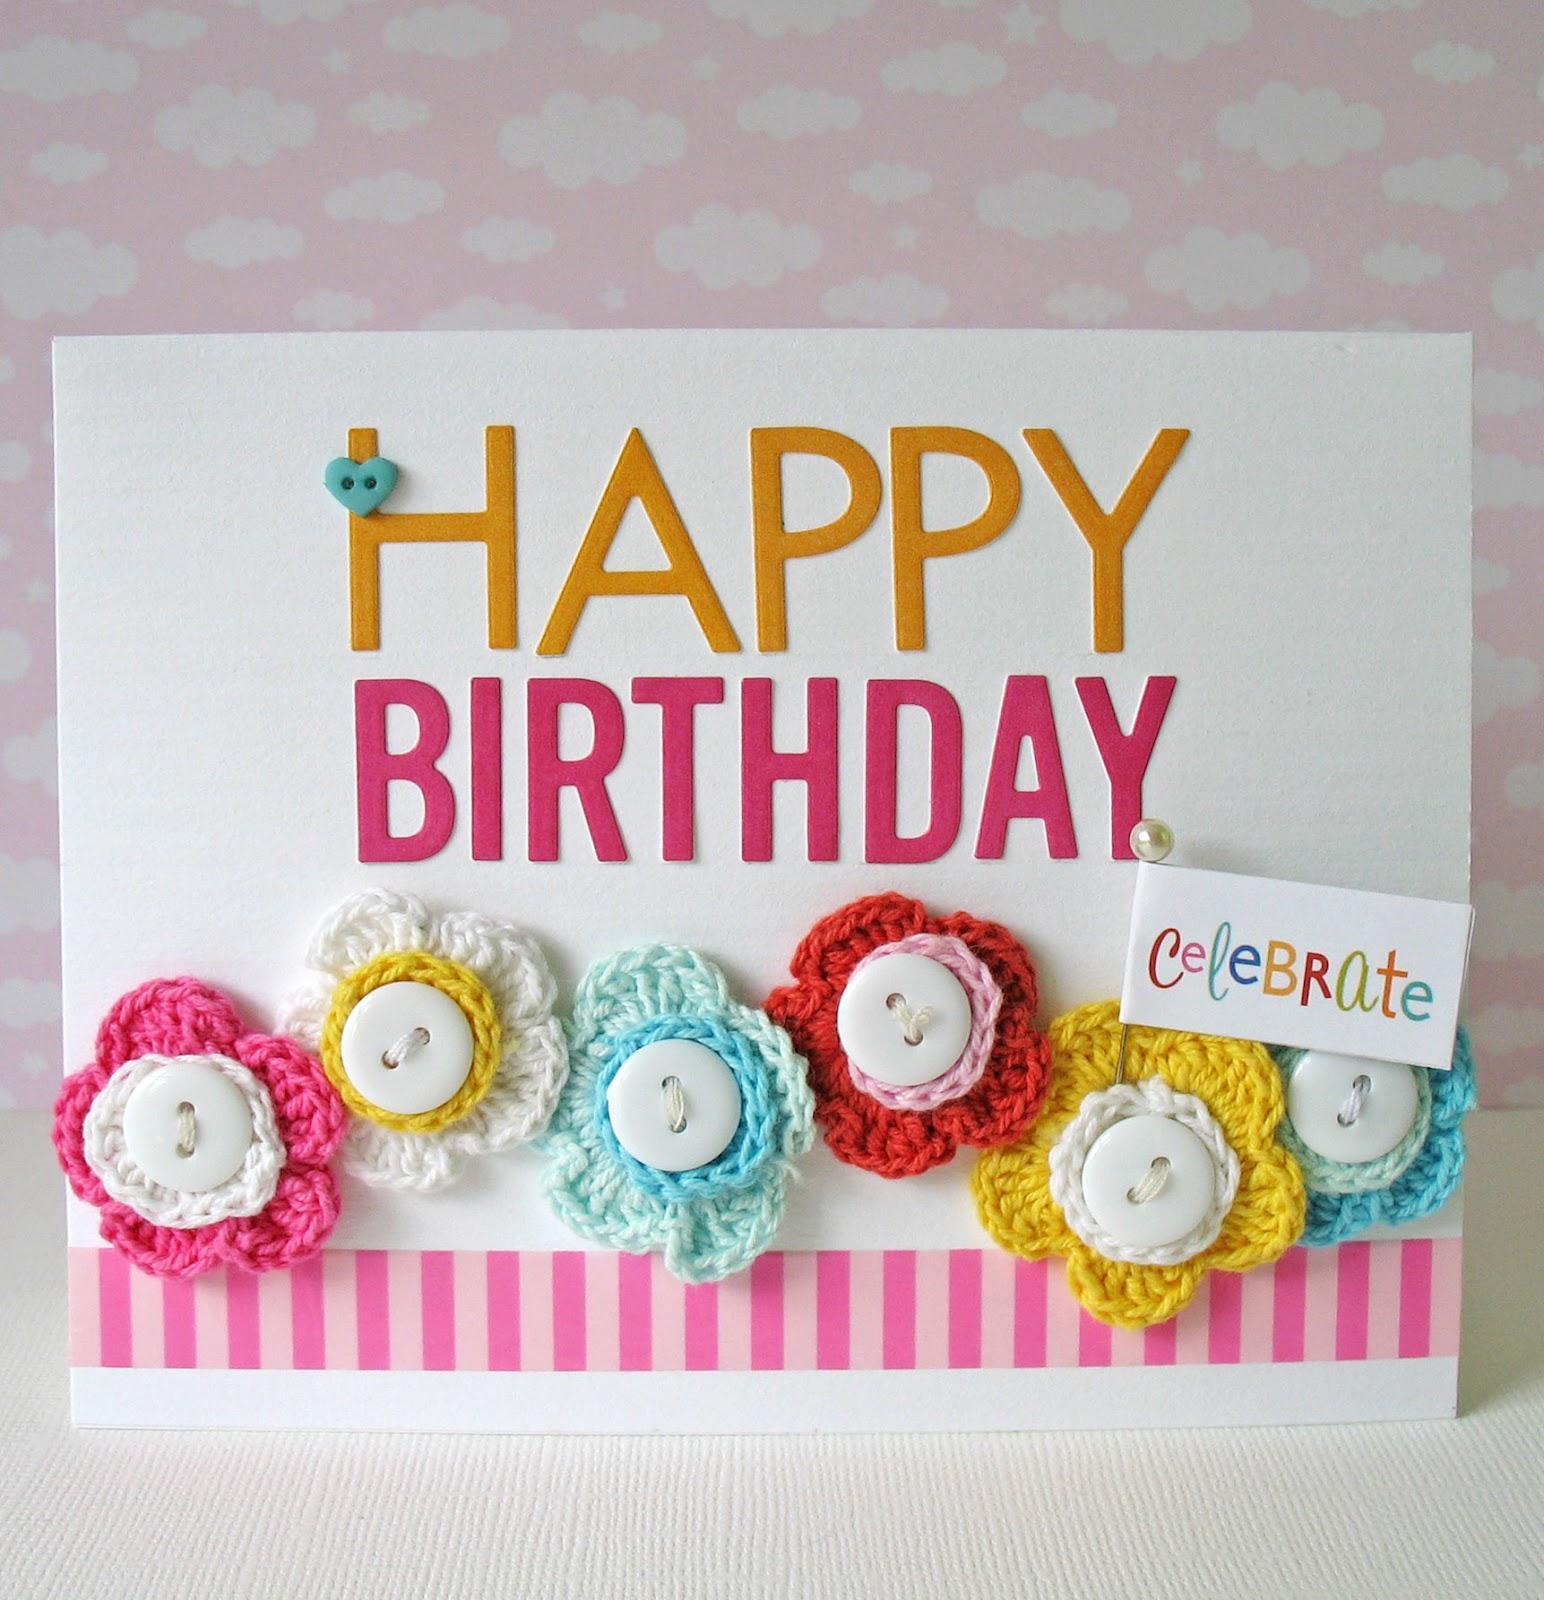 happy birthday card for - photo #4